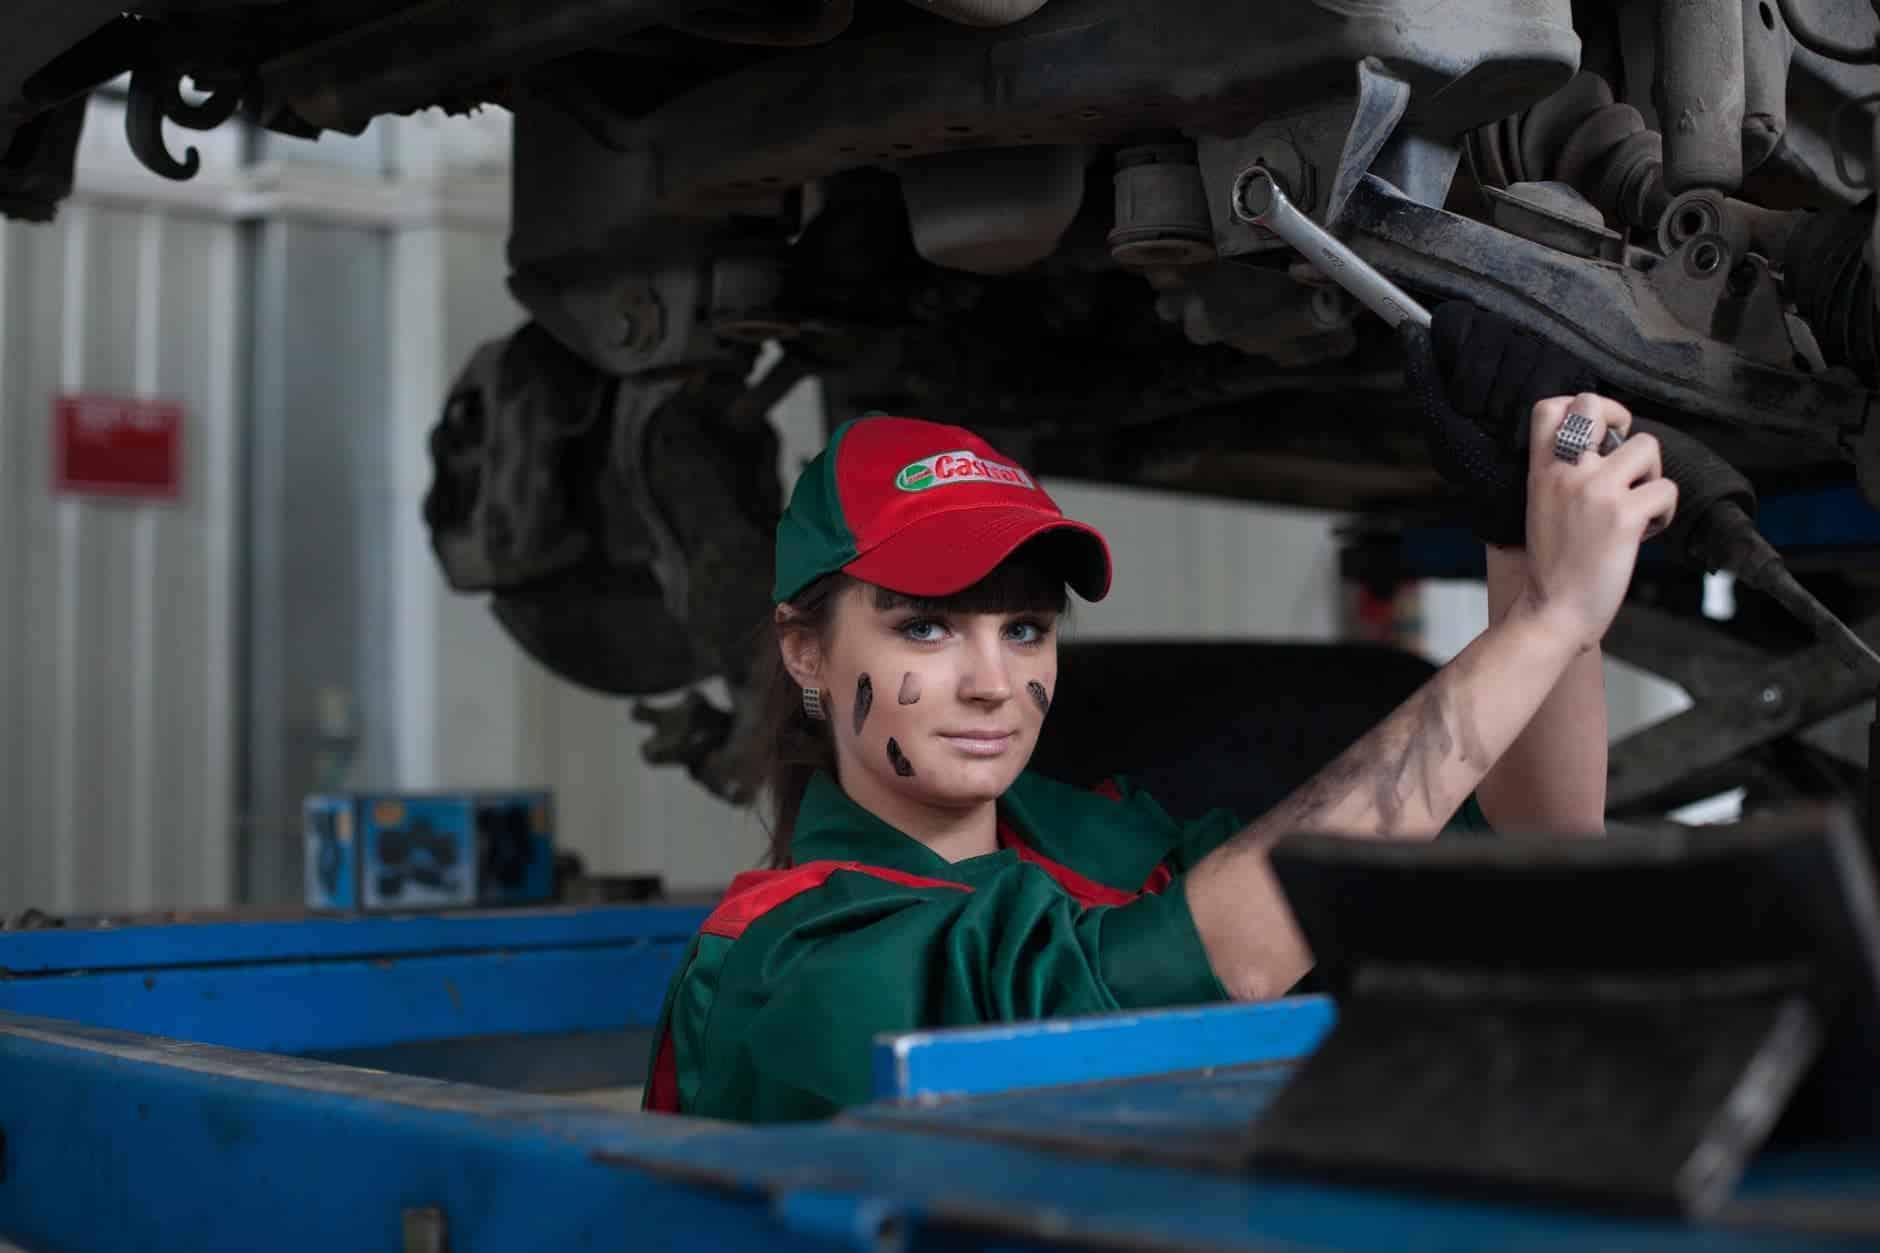 automotive stores key copy